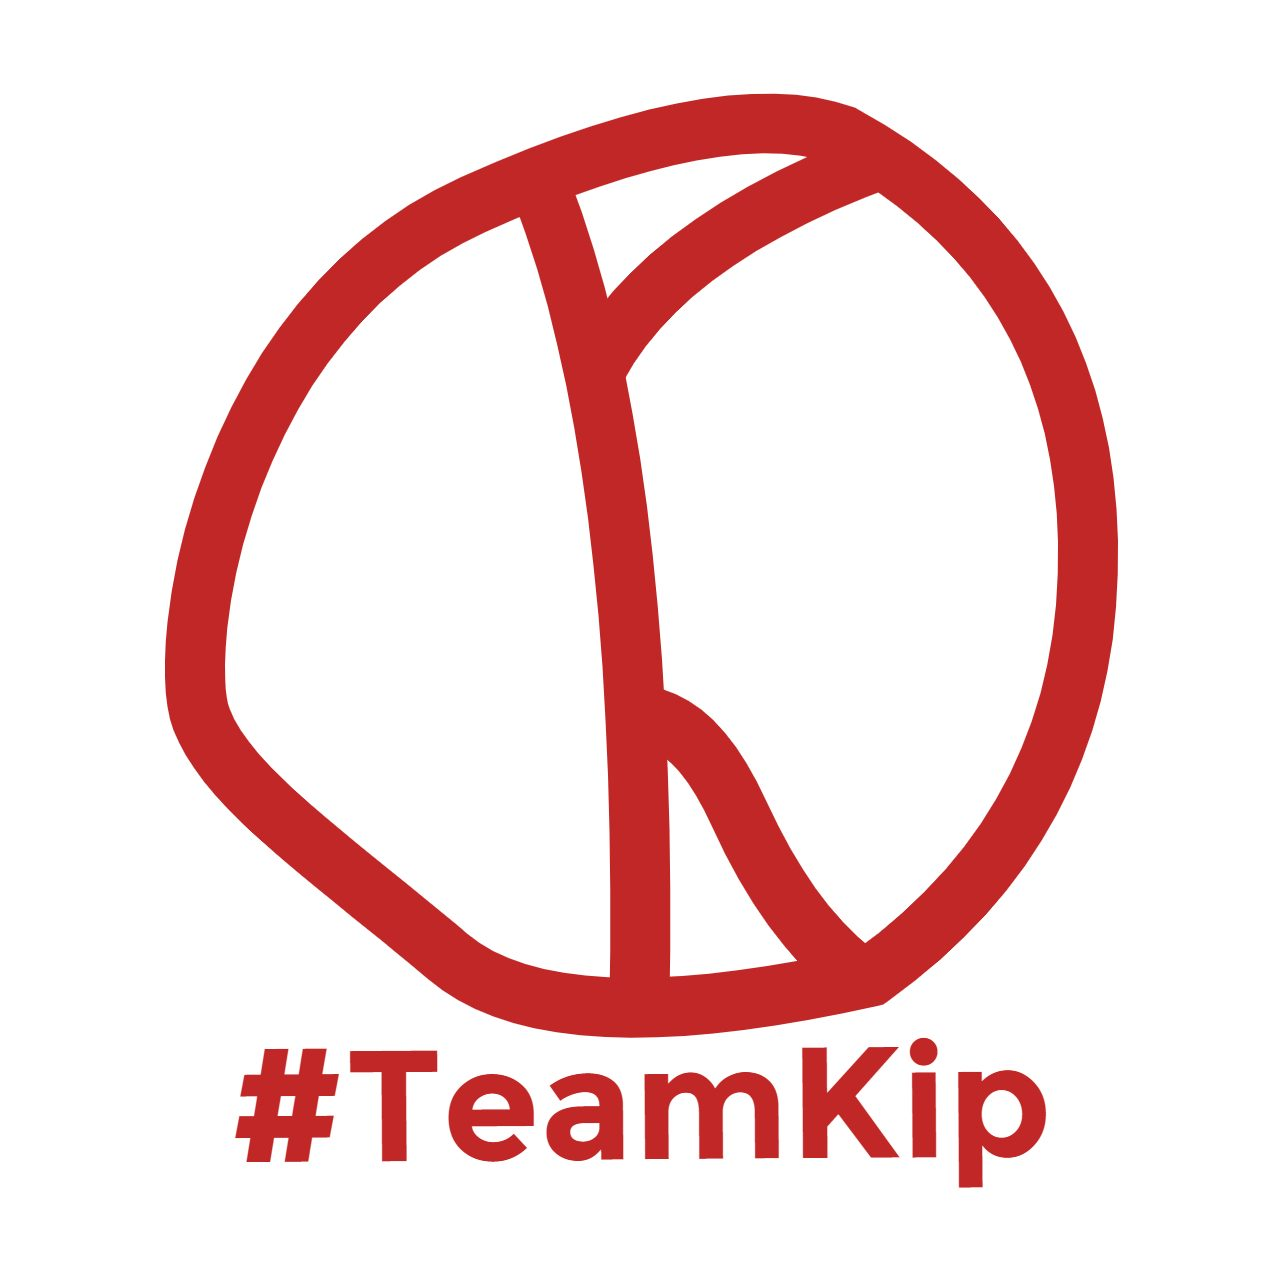 #Teamkip